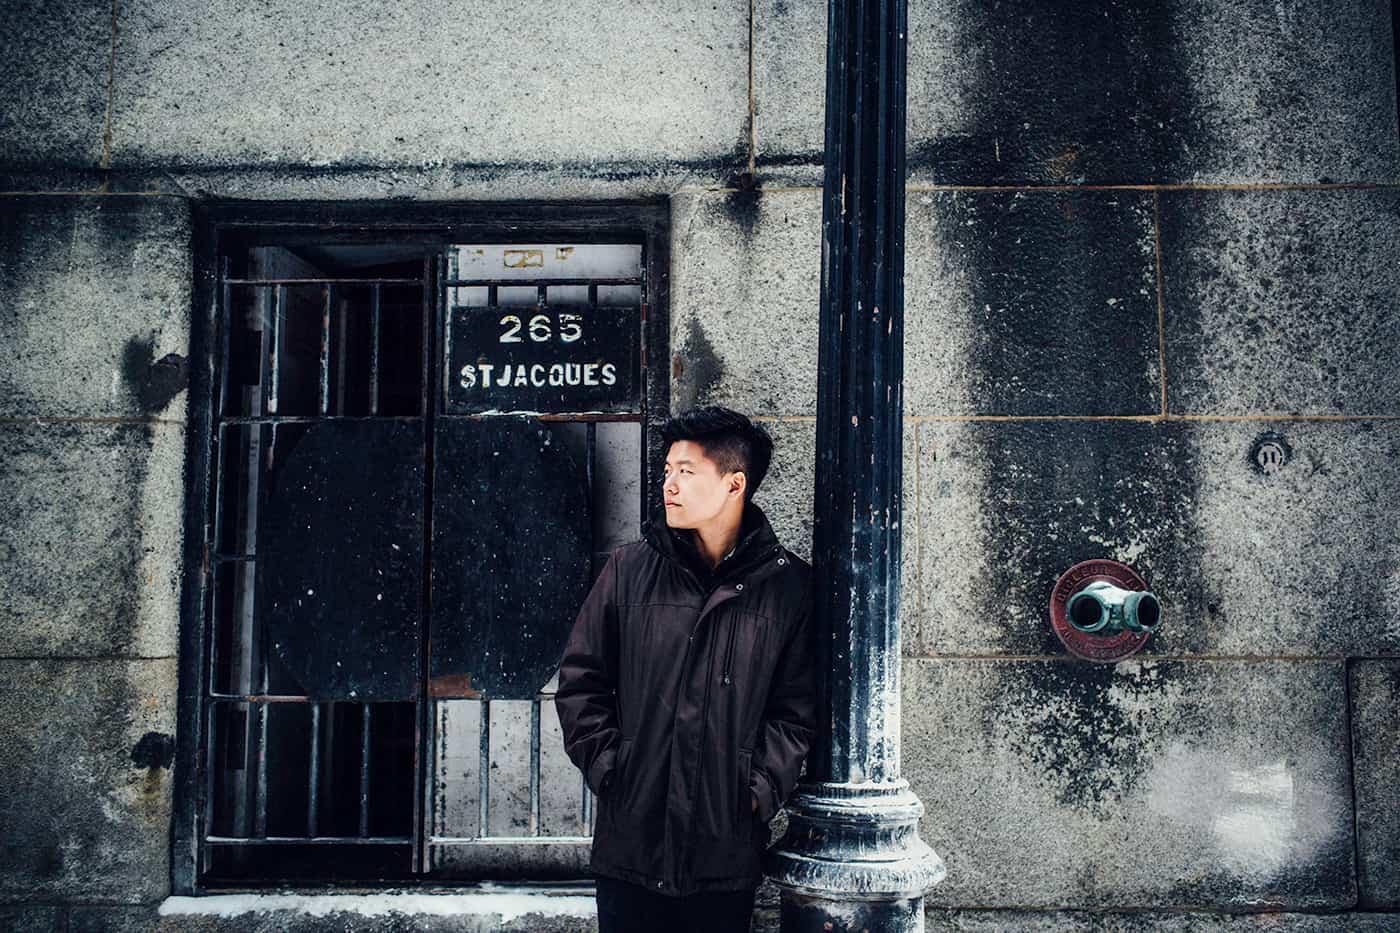 William Kuo composer